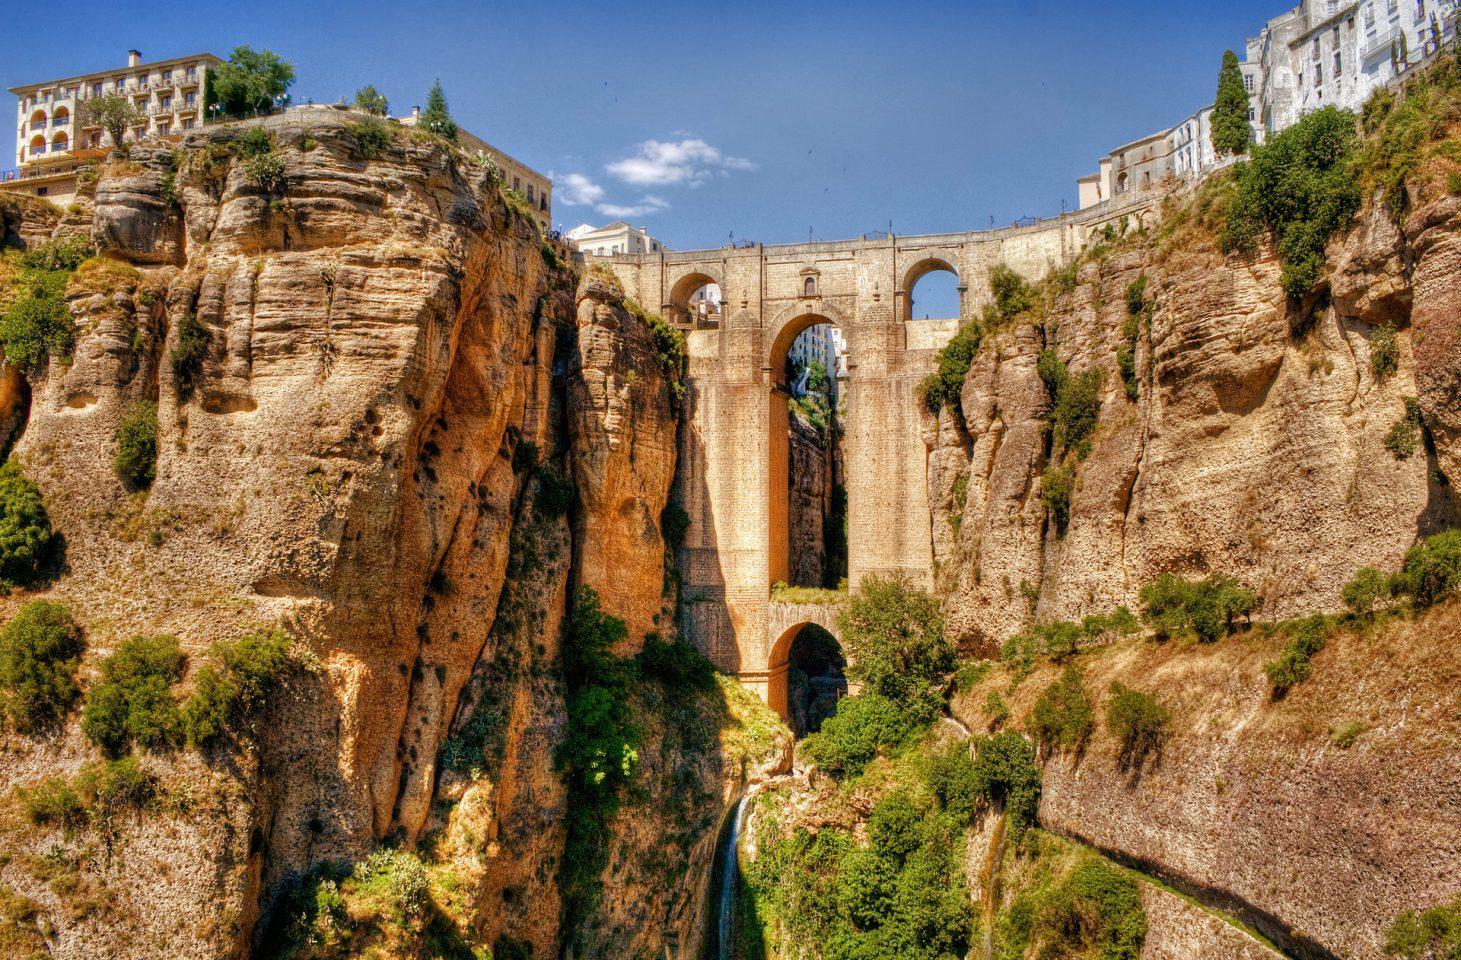 andalusia2 Μέρη που αξίζει να επισκεφτείς μέσα στο 2017 (μέρος β')